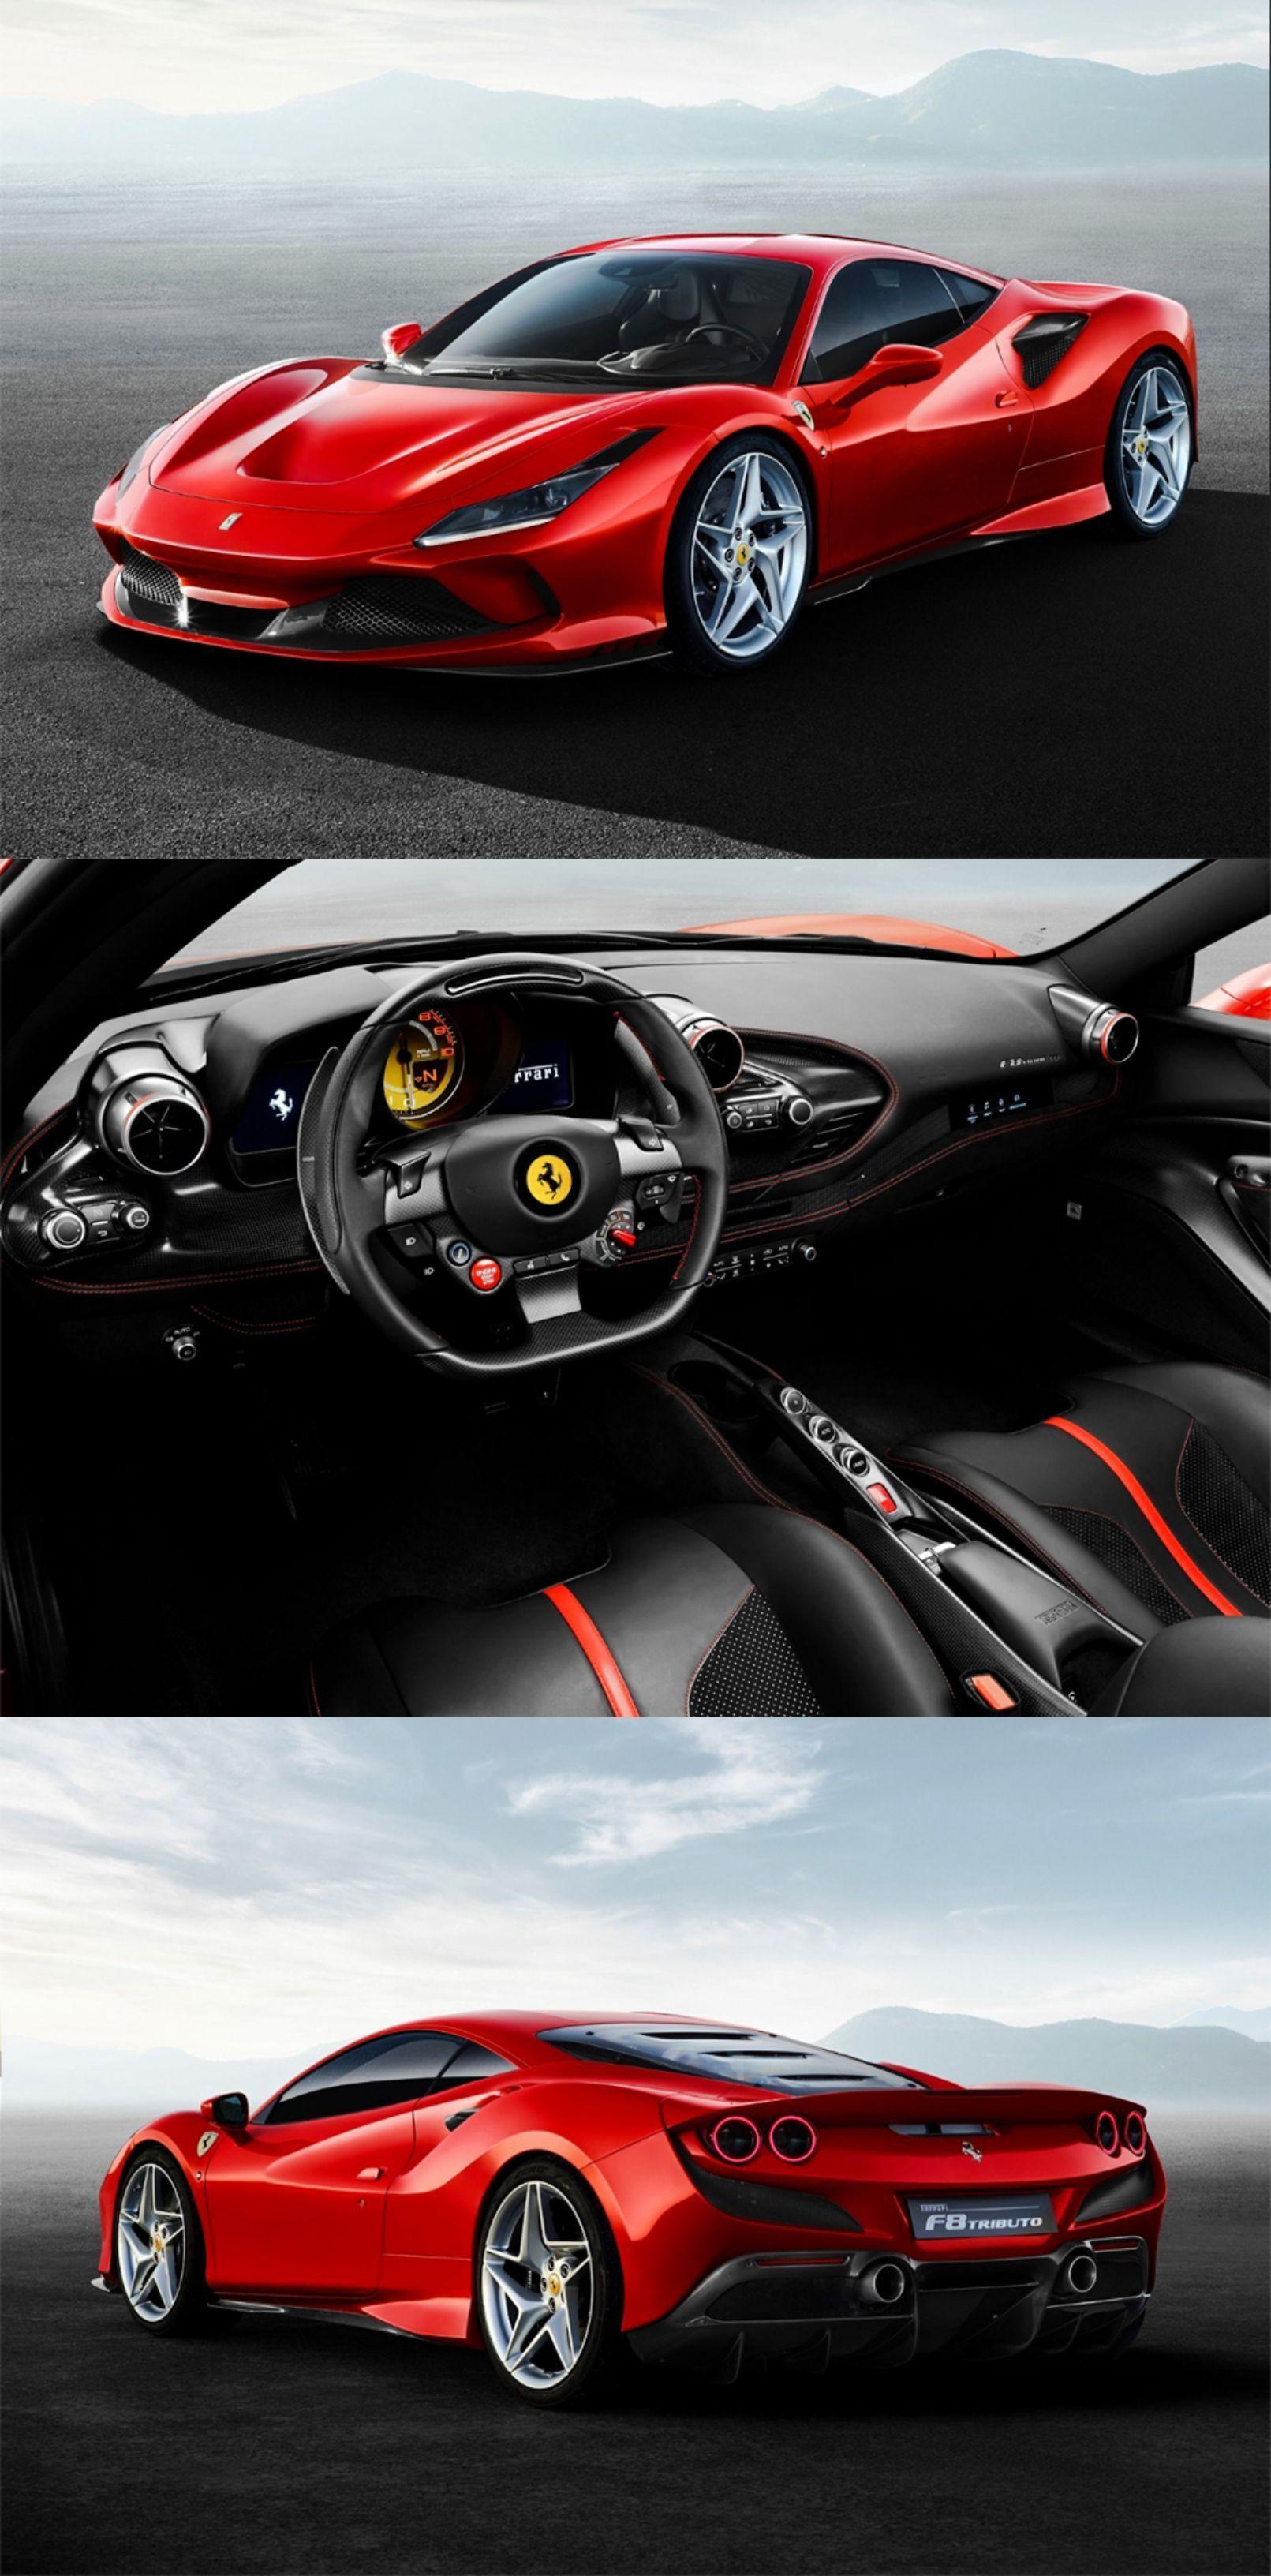 Pin Von Taiki ʖ Auf Carros E Motos Ferrari Motor Autos